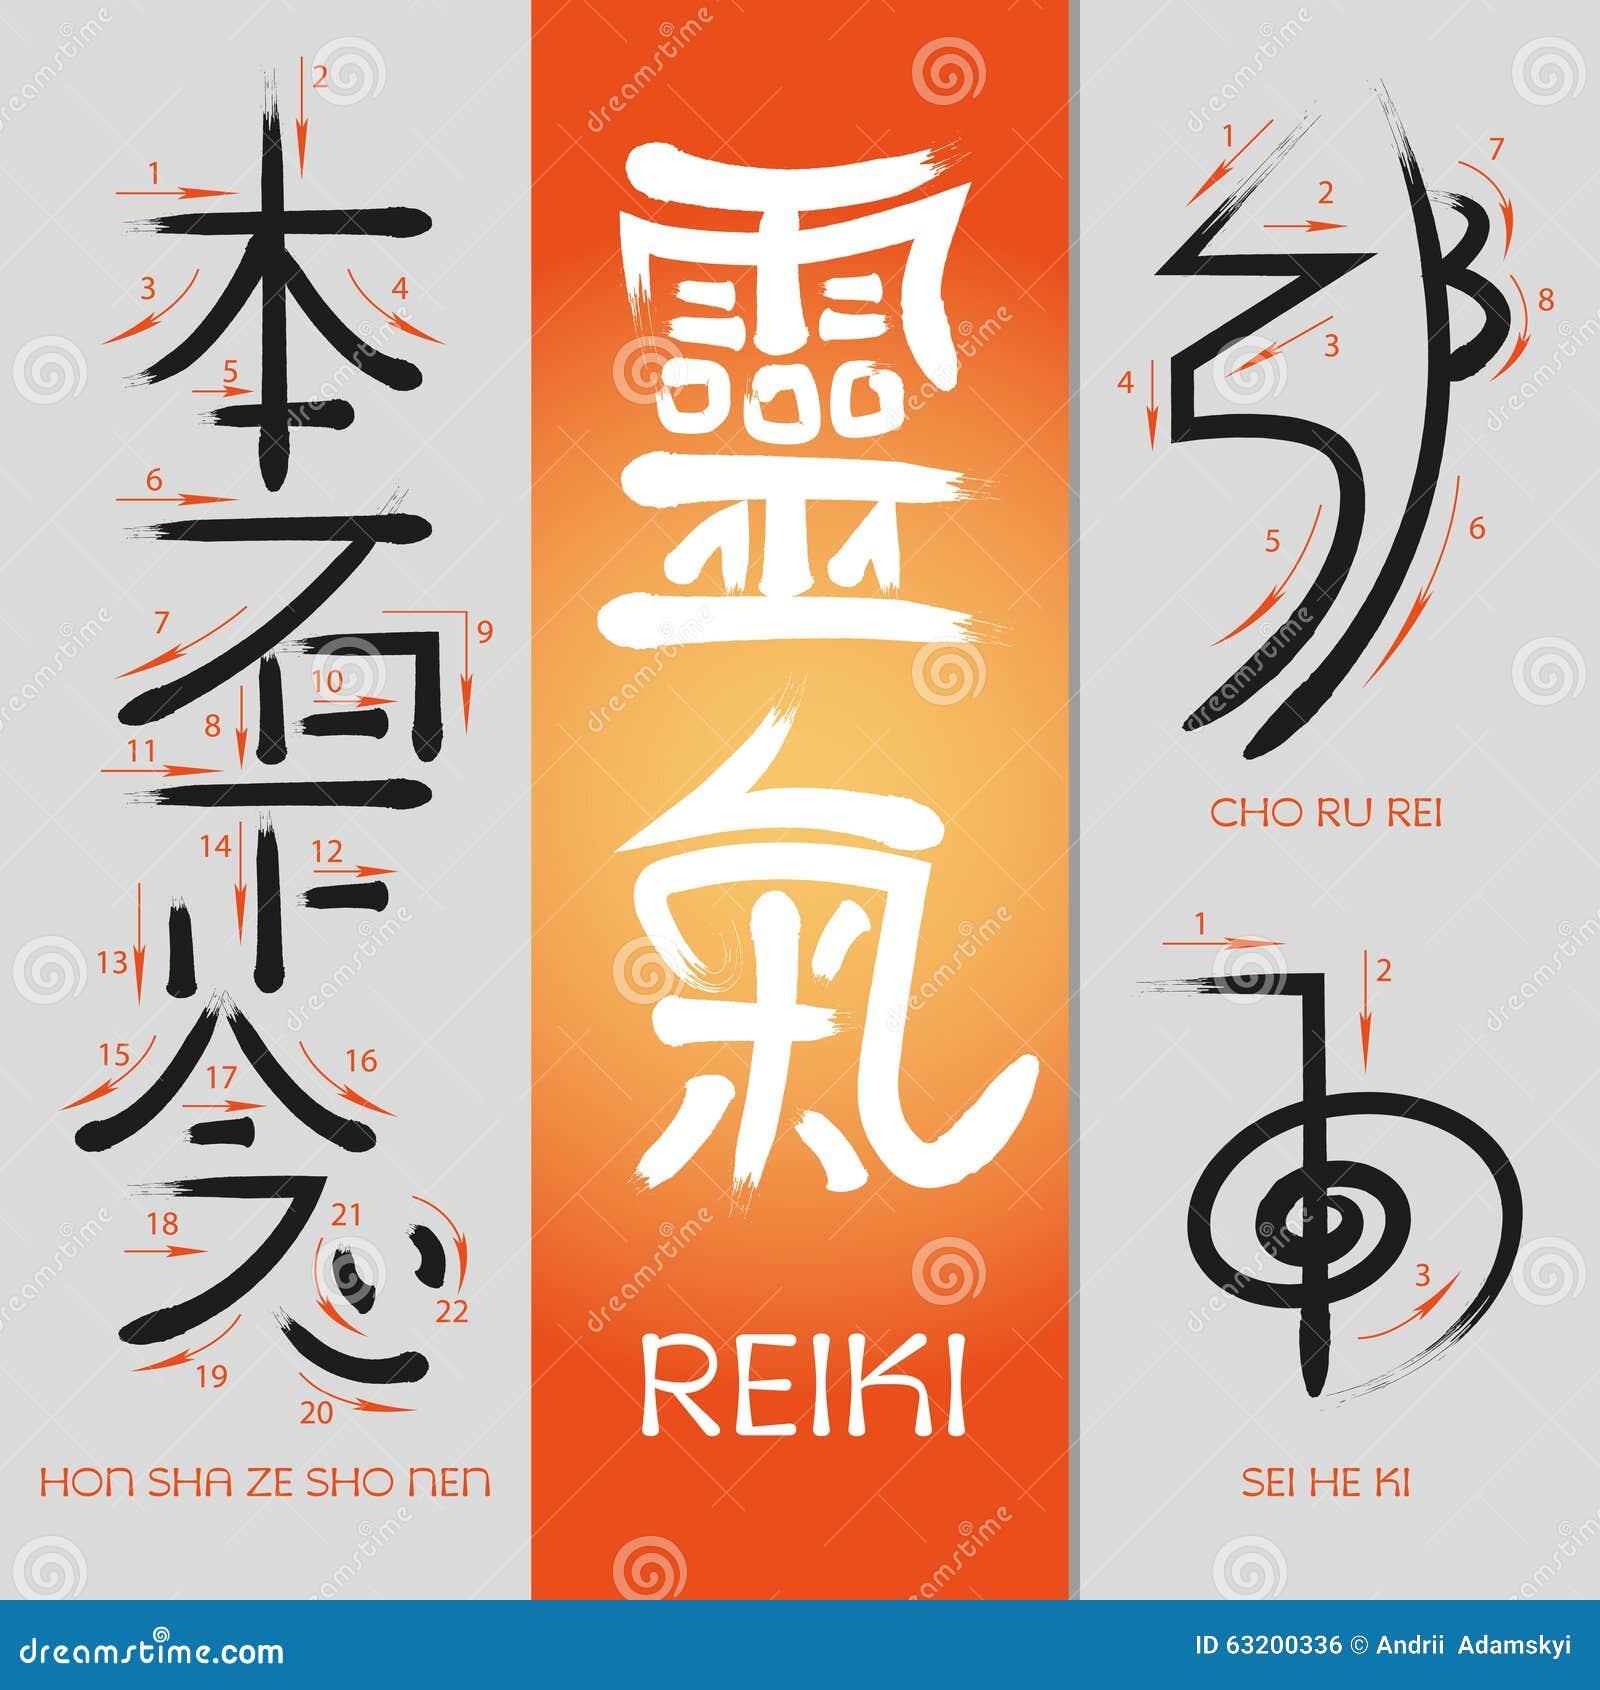 Reiki symbols stock vector illustration of lifestyle 63200336 reiki symbols buycottarizona Images